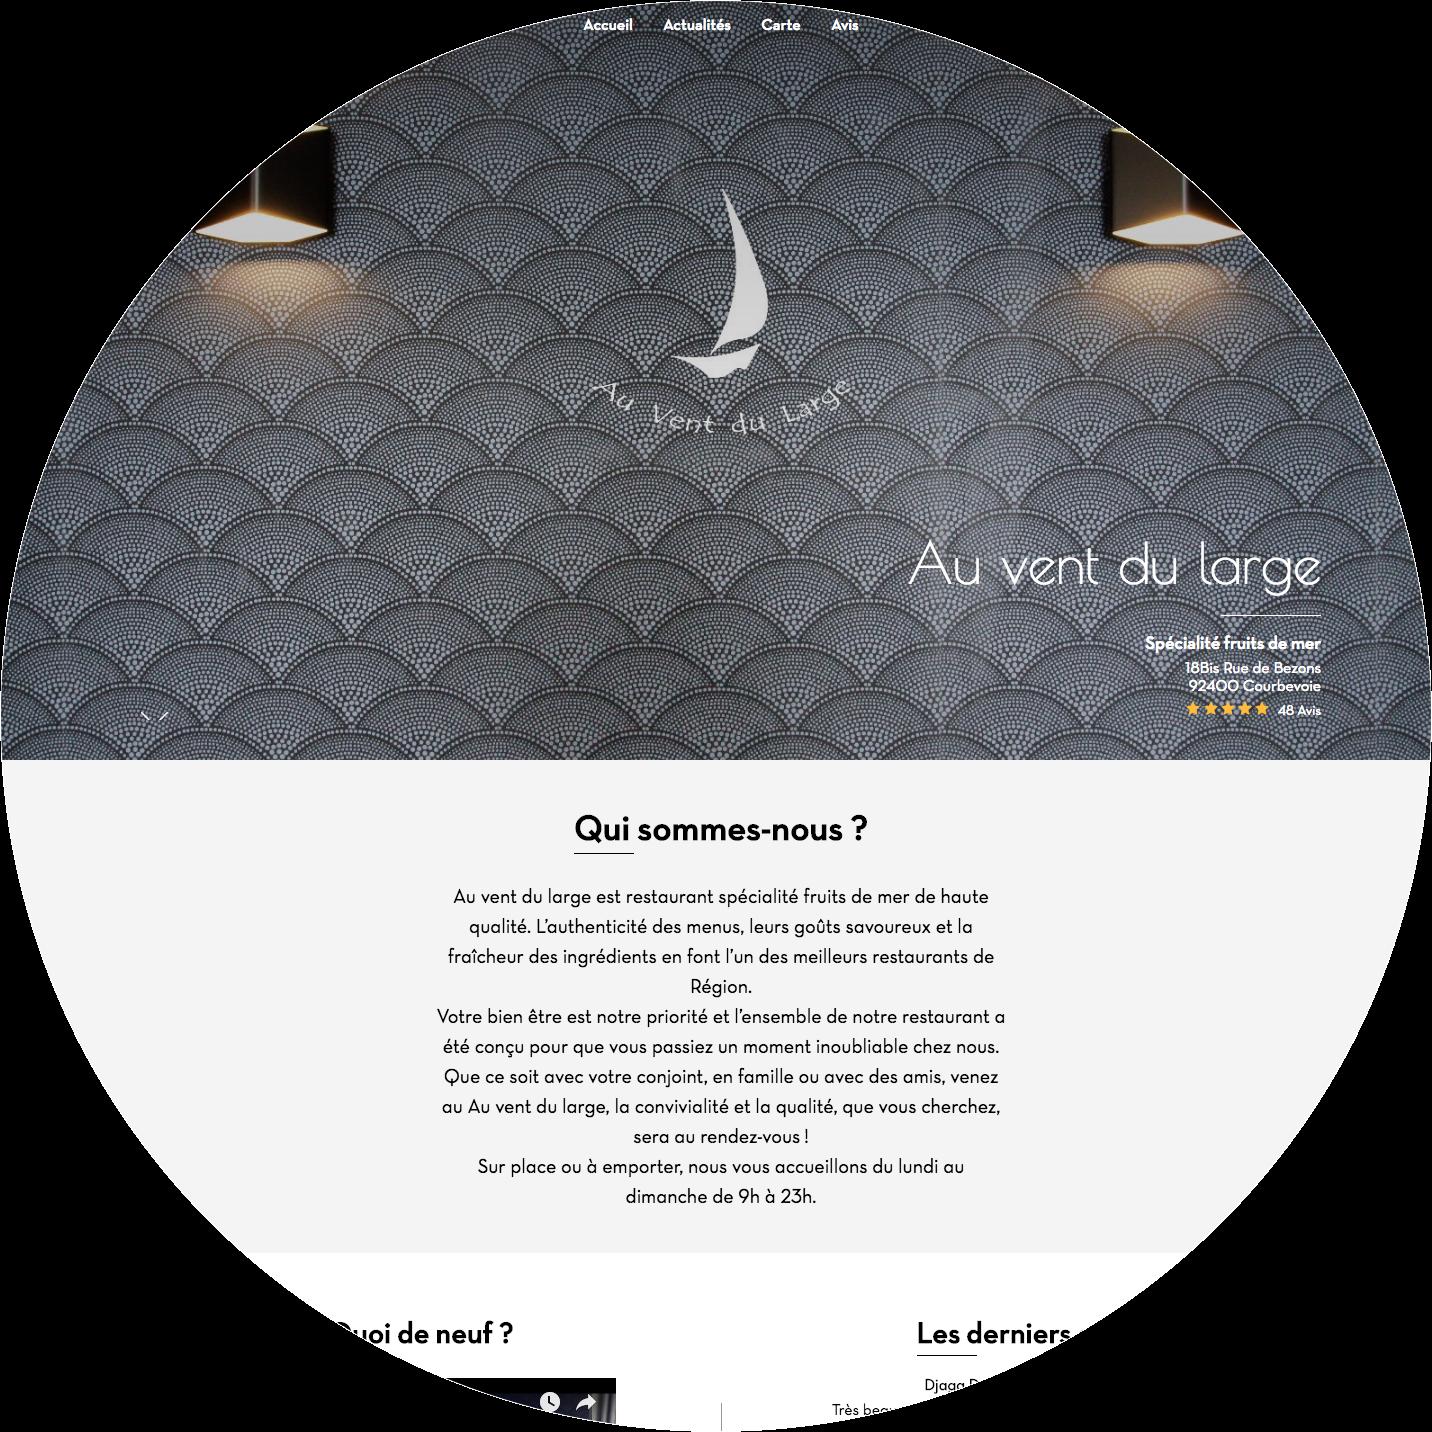 AuVentDuLargeCourbevoie - Website - desktop&mobile